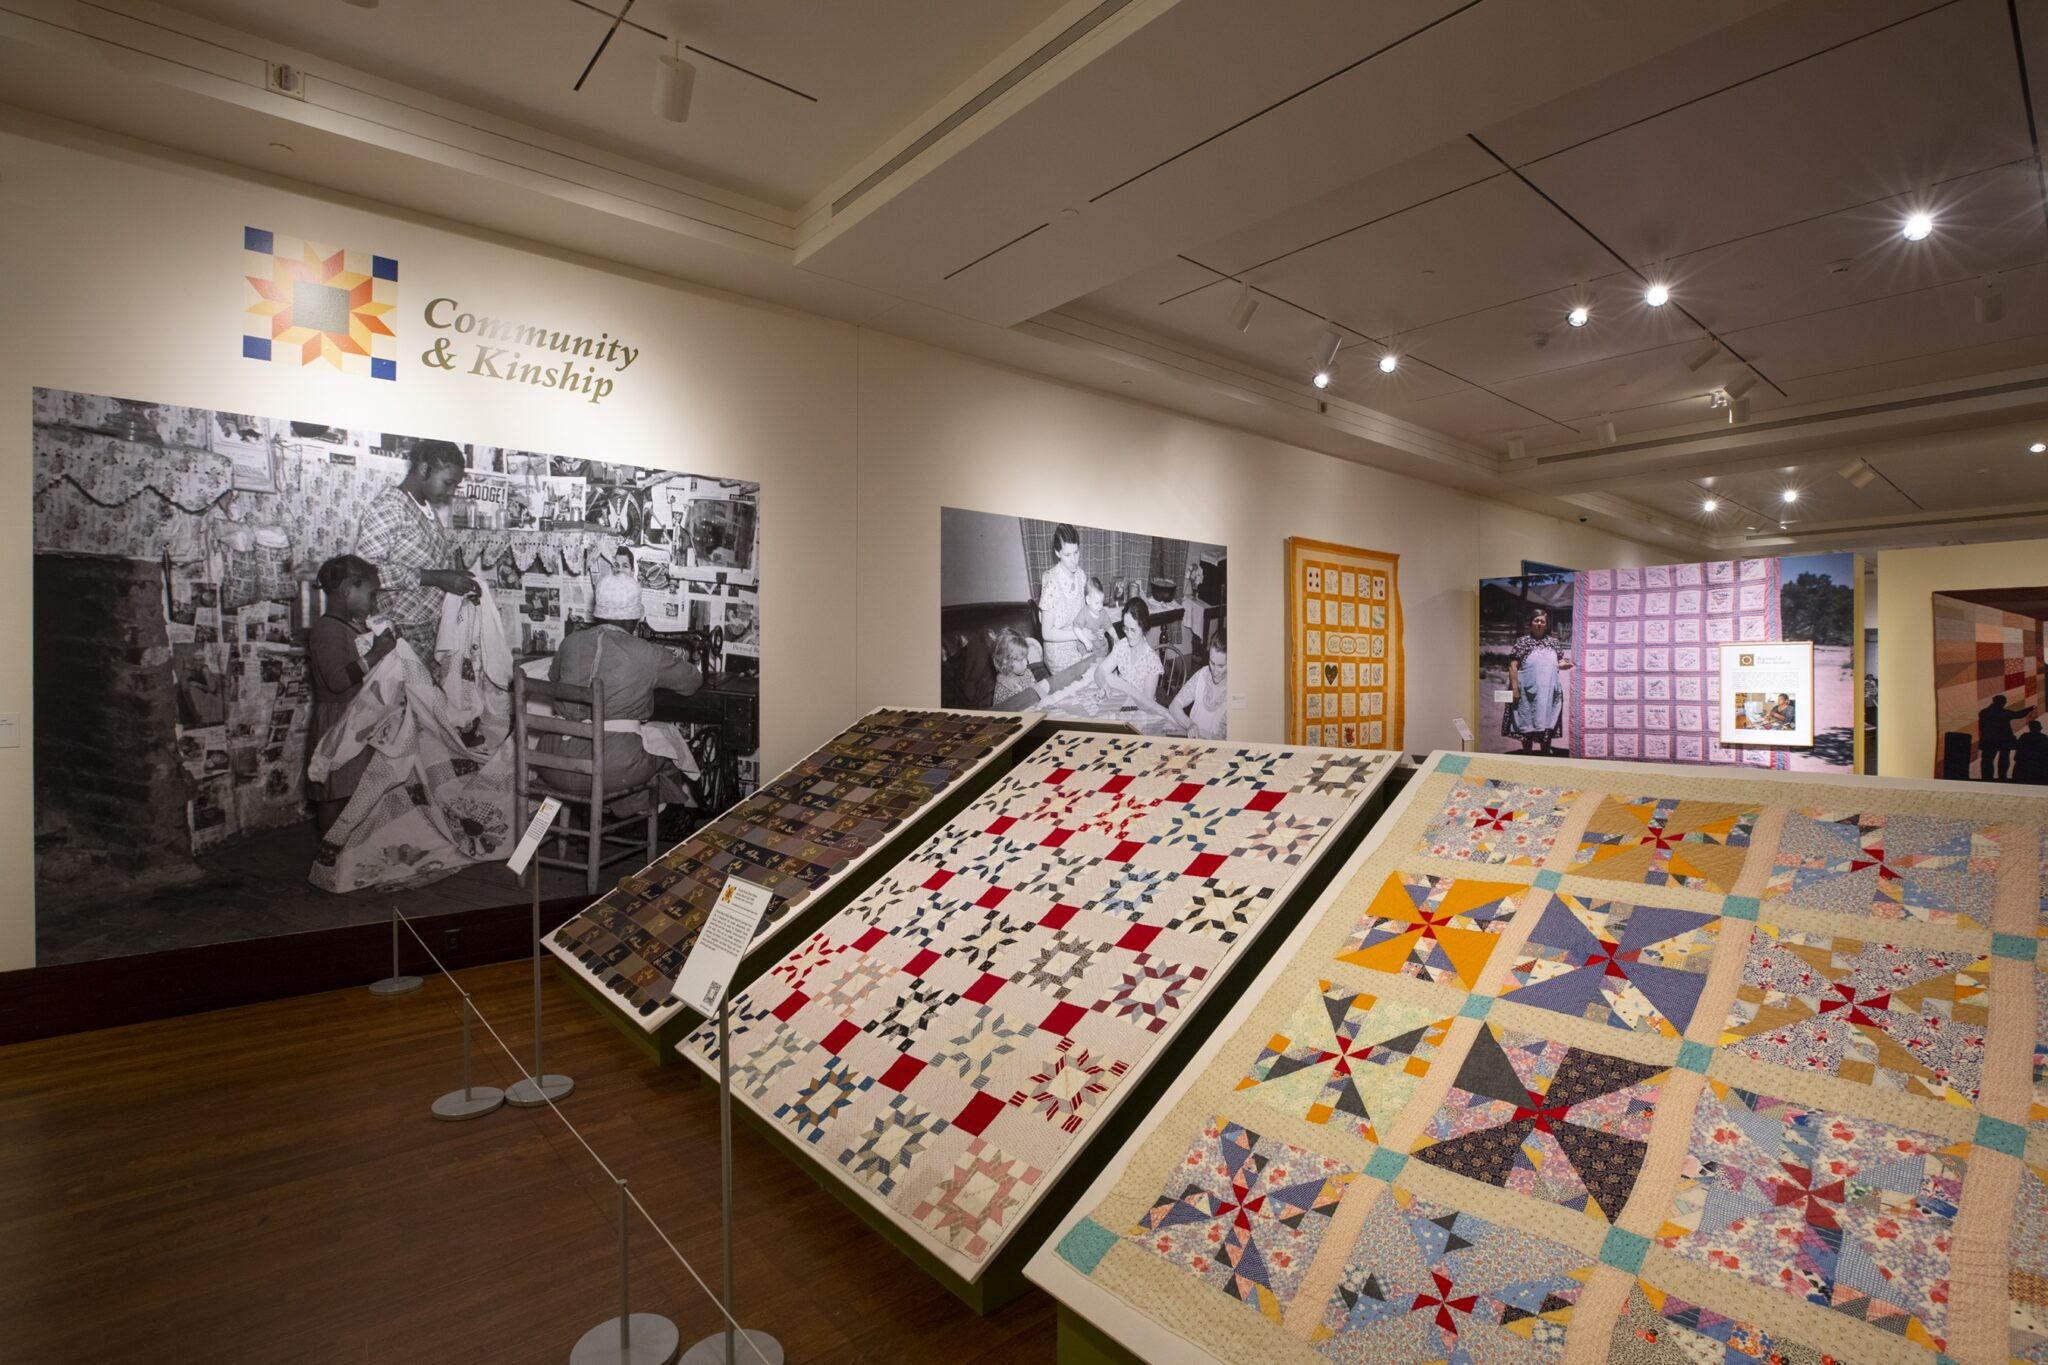 Eiteljorg Museum of American Indians & Western Art to reopen